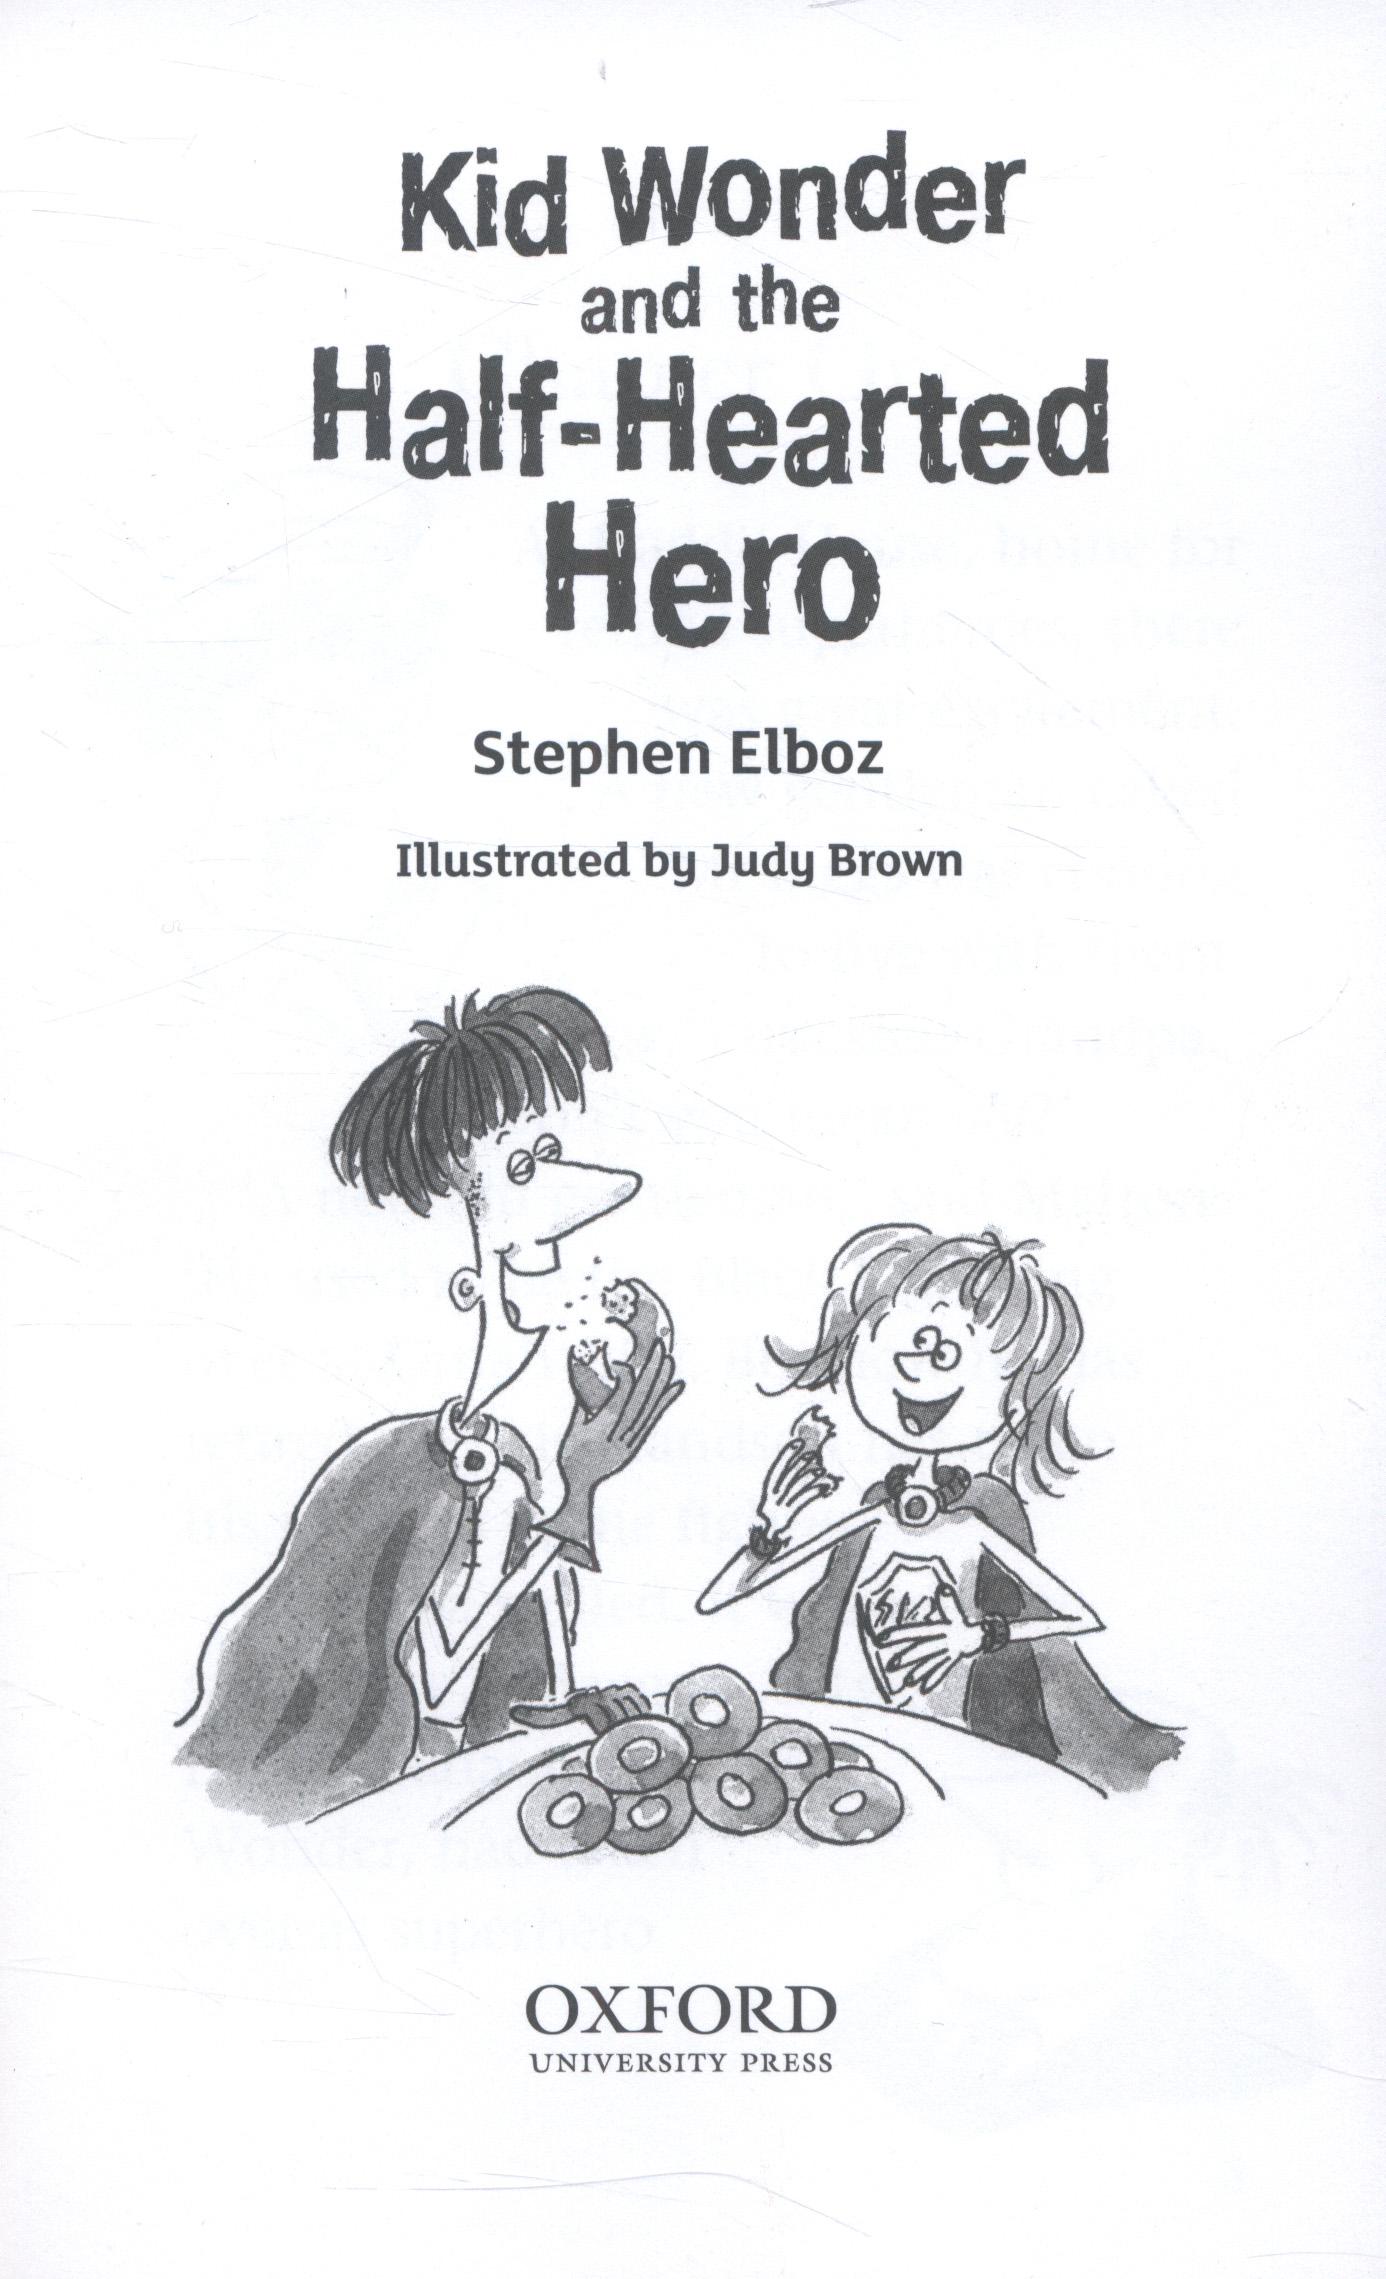 Kid Wonder and the half-hearted hero by Elboz, Stephen